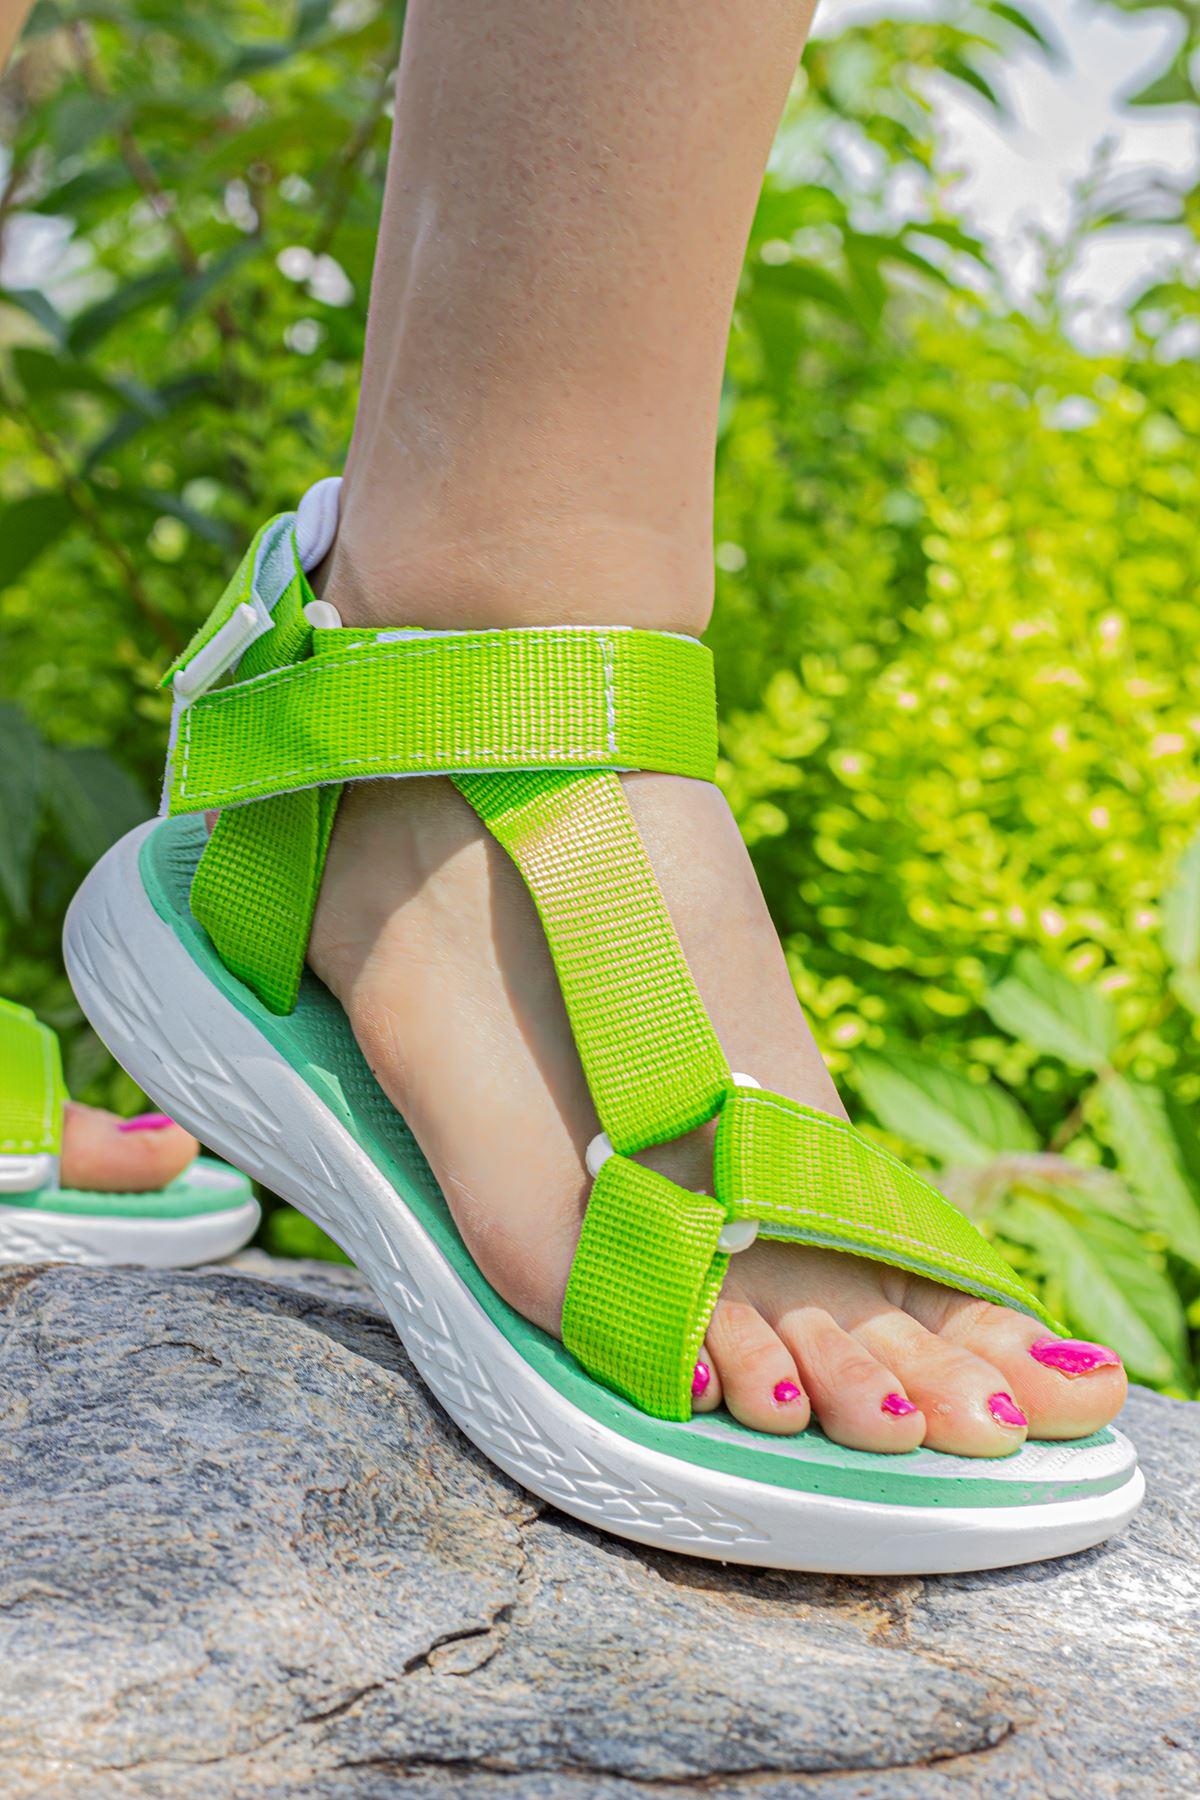 CERY KADIN SANDALET-Yeşil